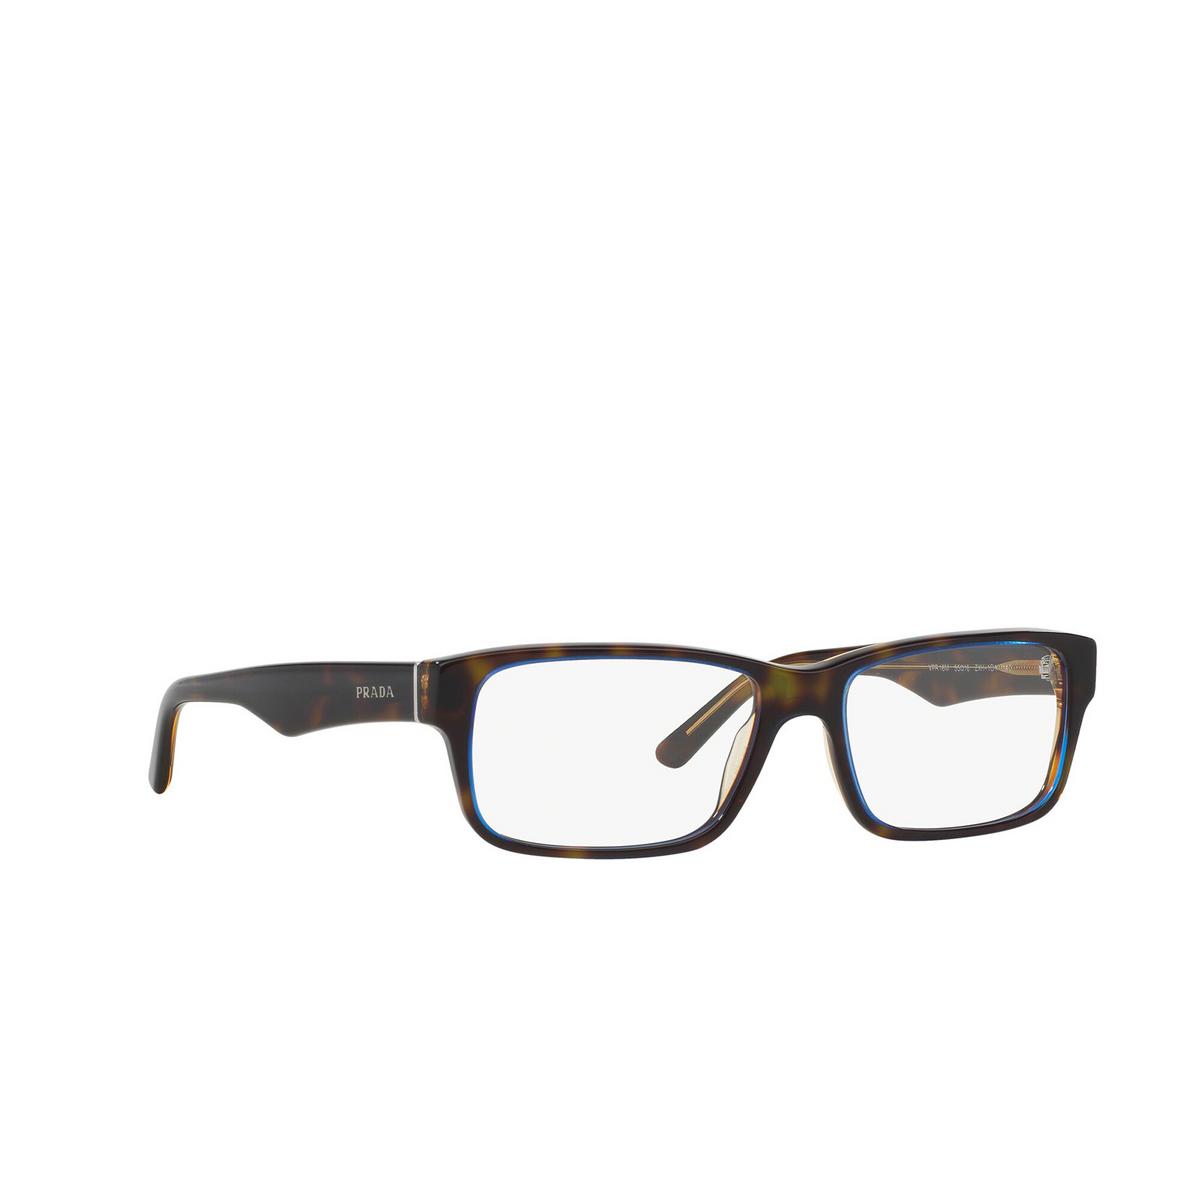 Prada® Rectangle Eyeglasses: Heritage PR 16MV color Tortoise Denim ZXH1O1 - three-quarters view.